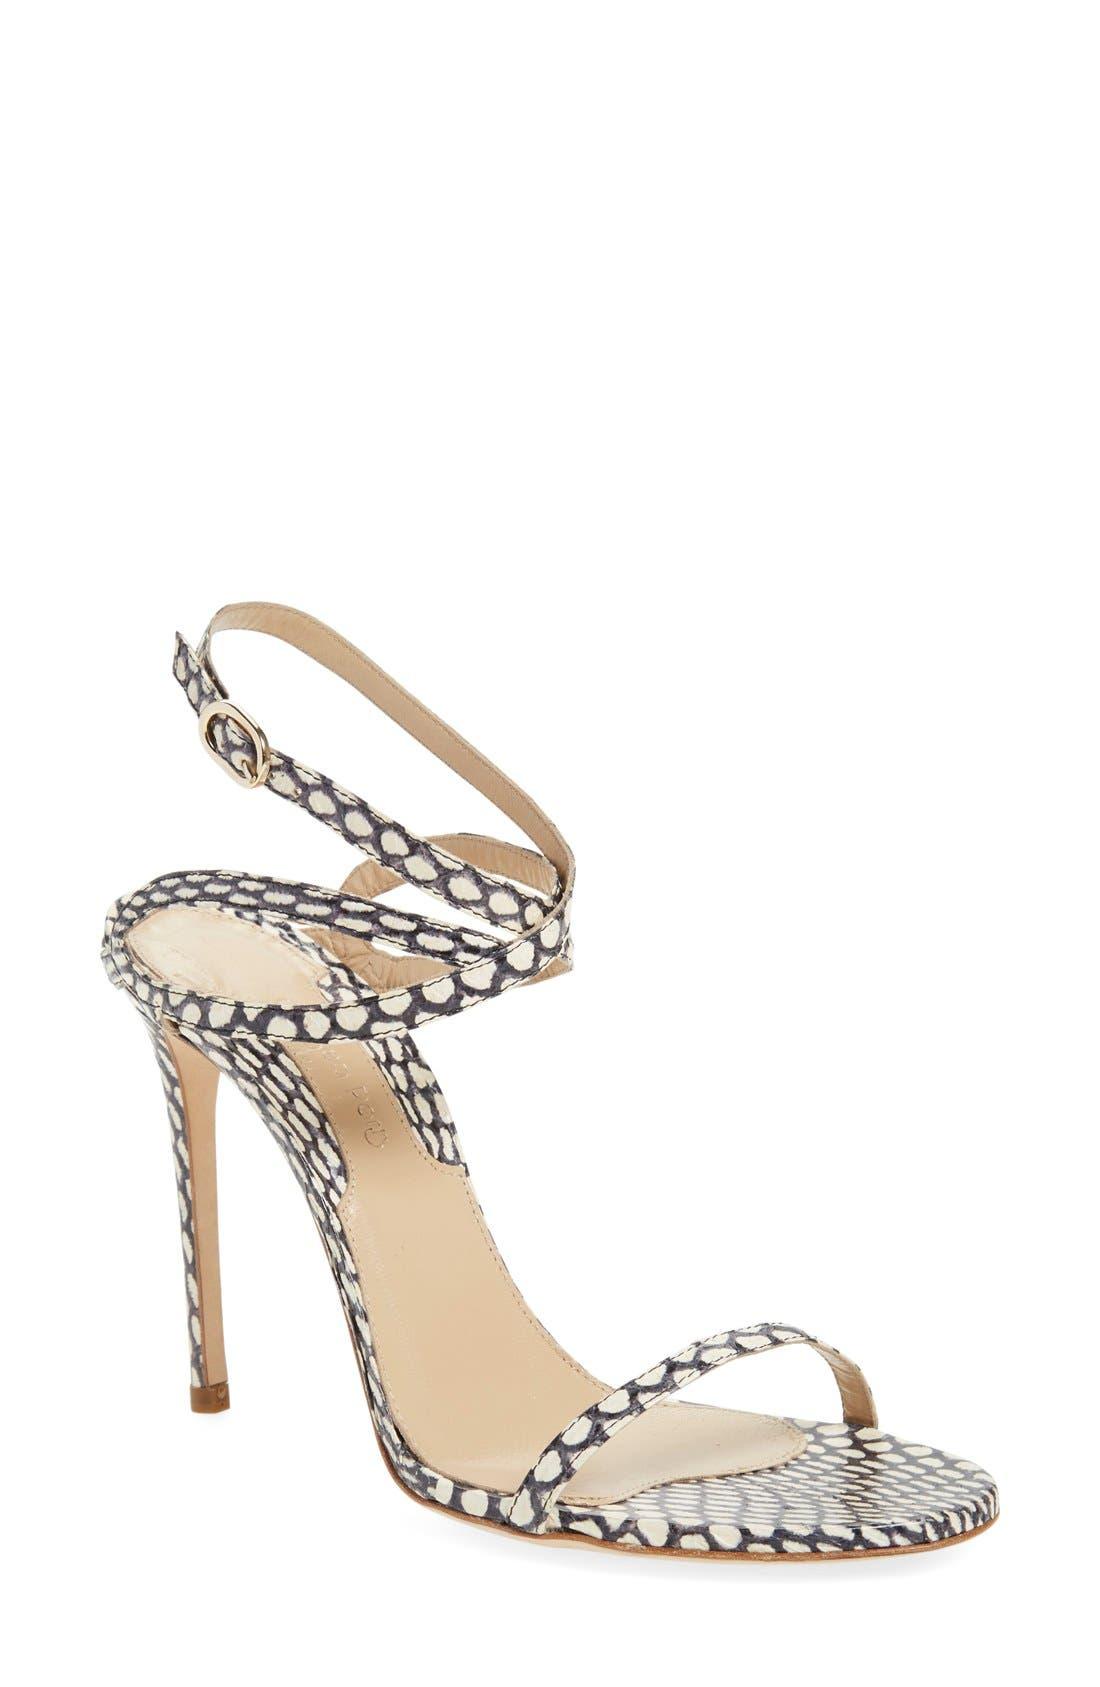 Alternate Image 1 Selected - Chelsea Paris 'Soyak' Ankle Strap Sandal (Women)